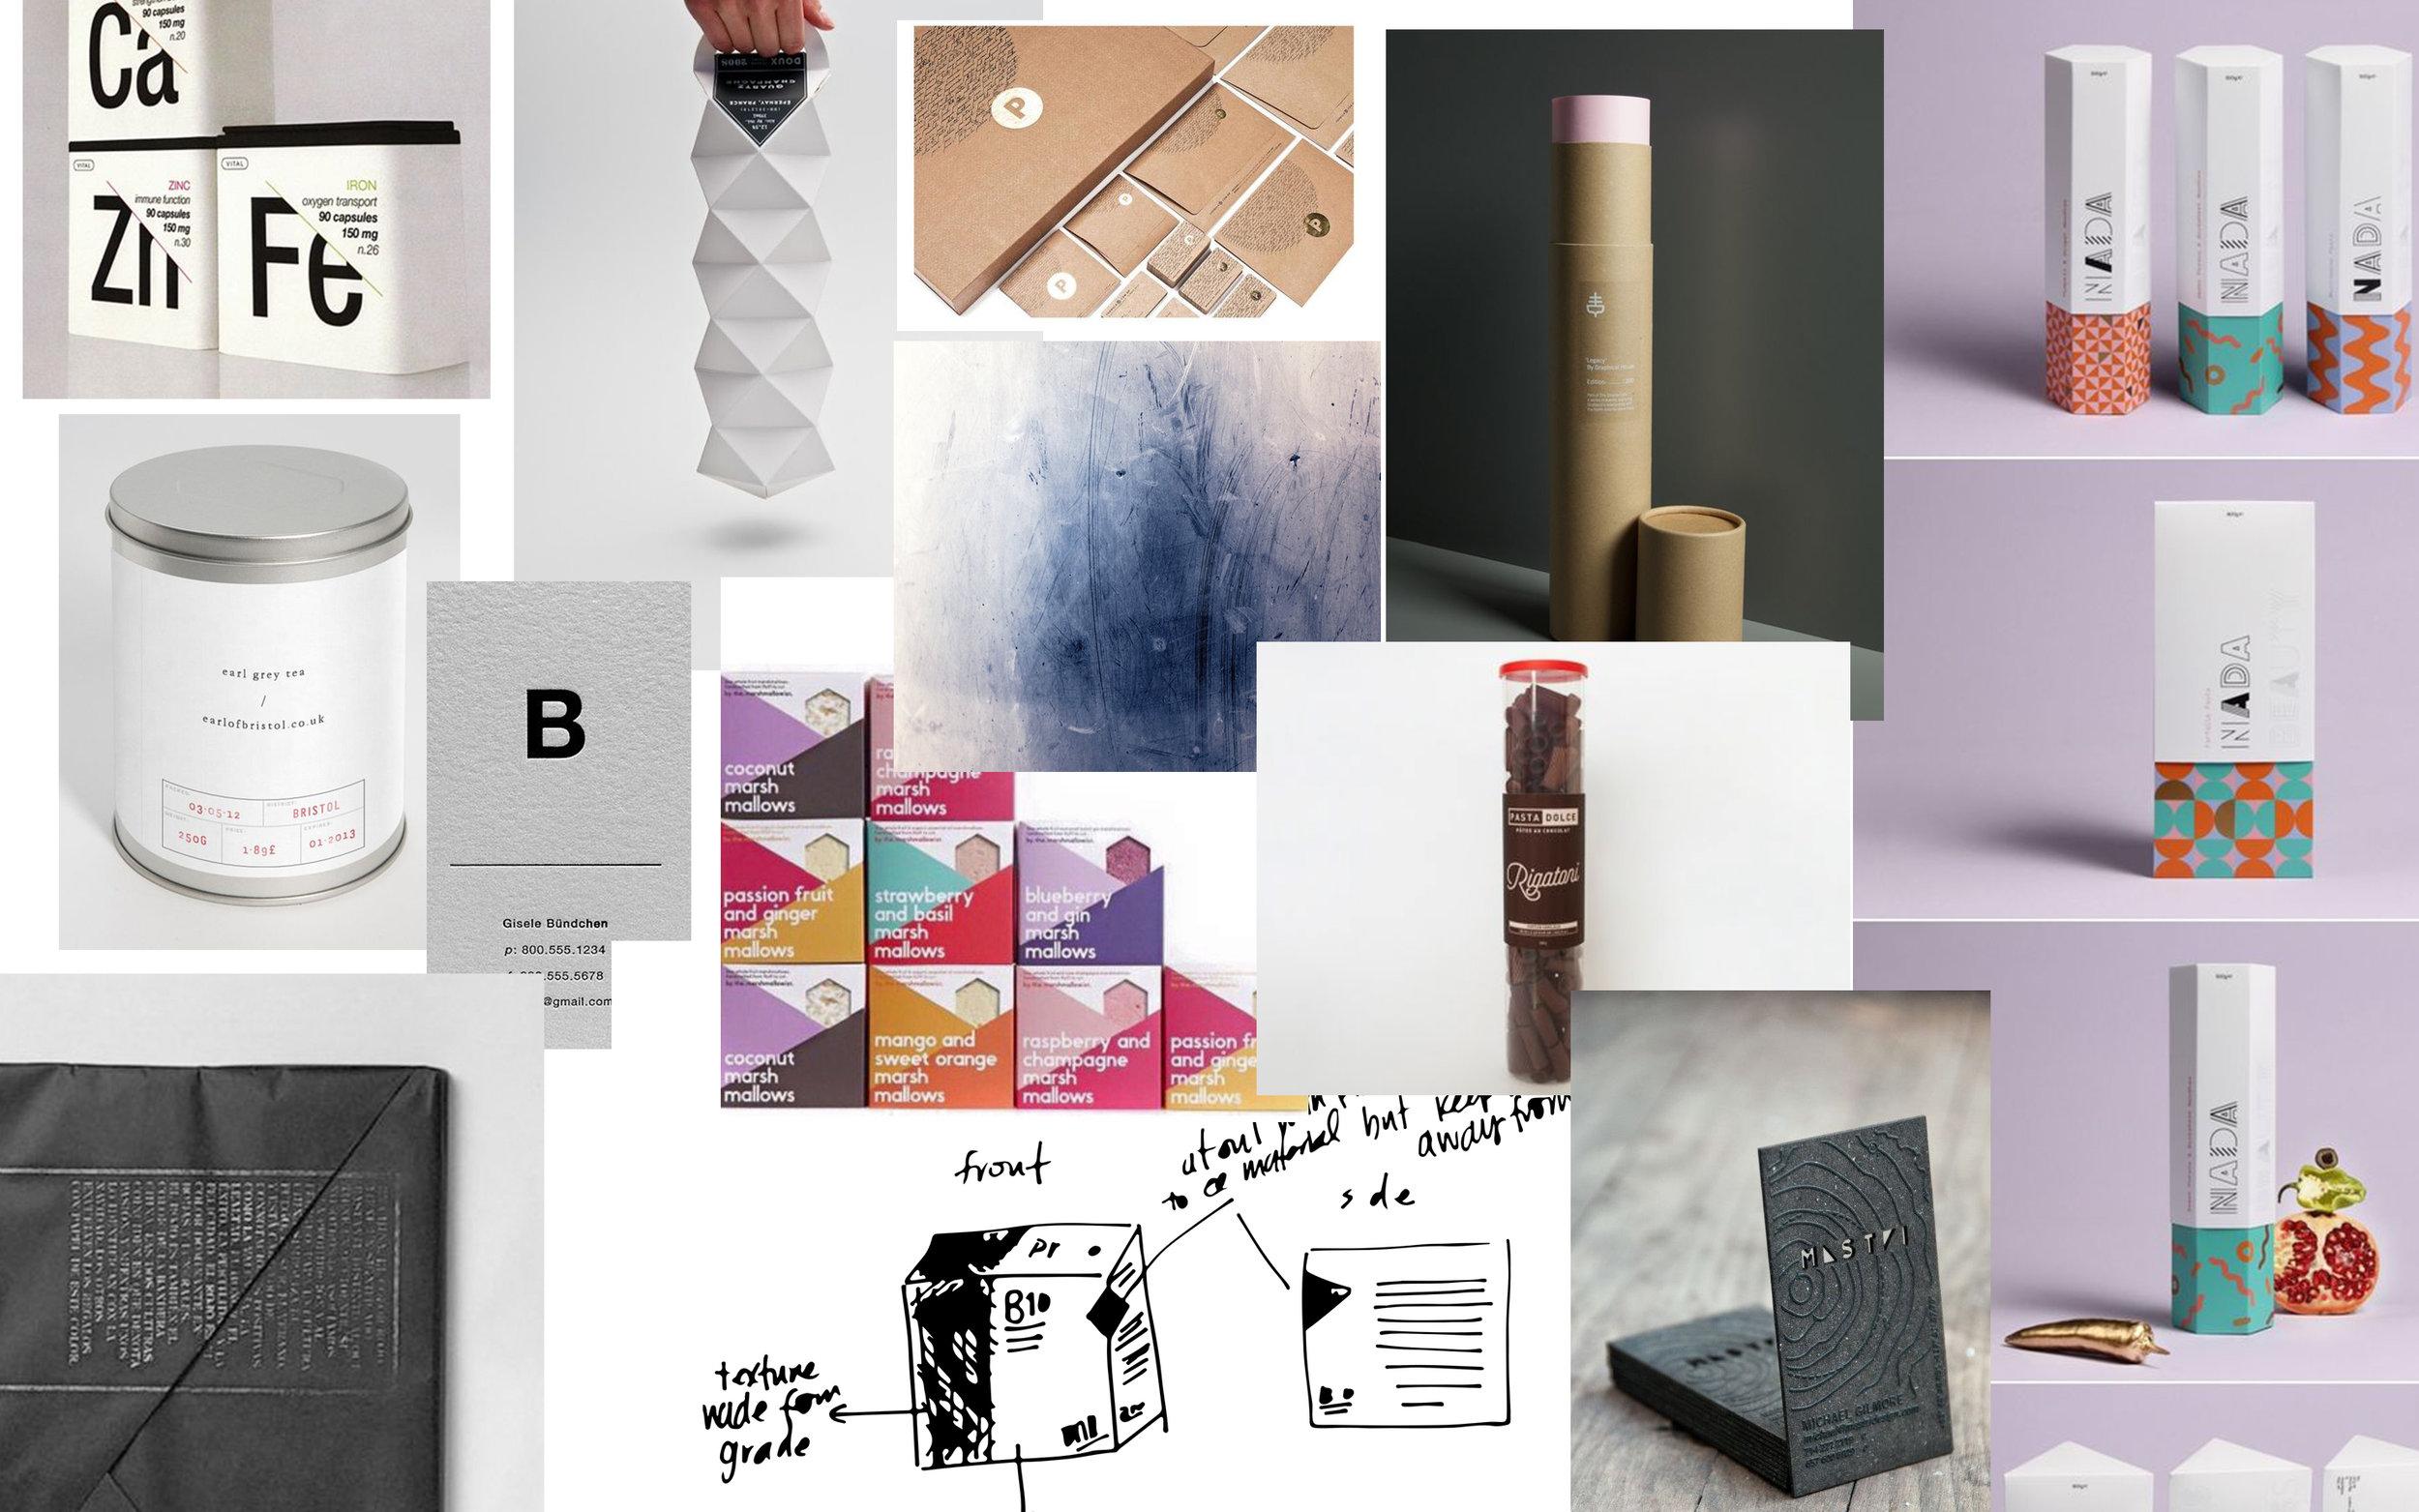 Brillo_Packaging.jpg